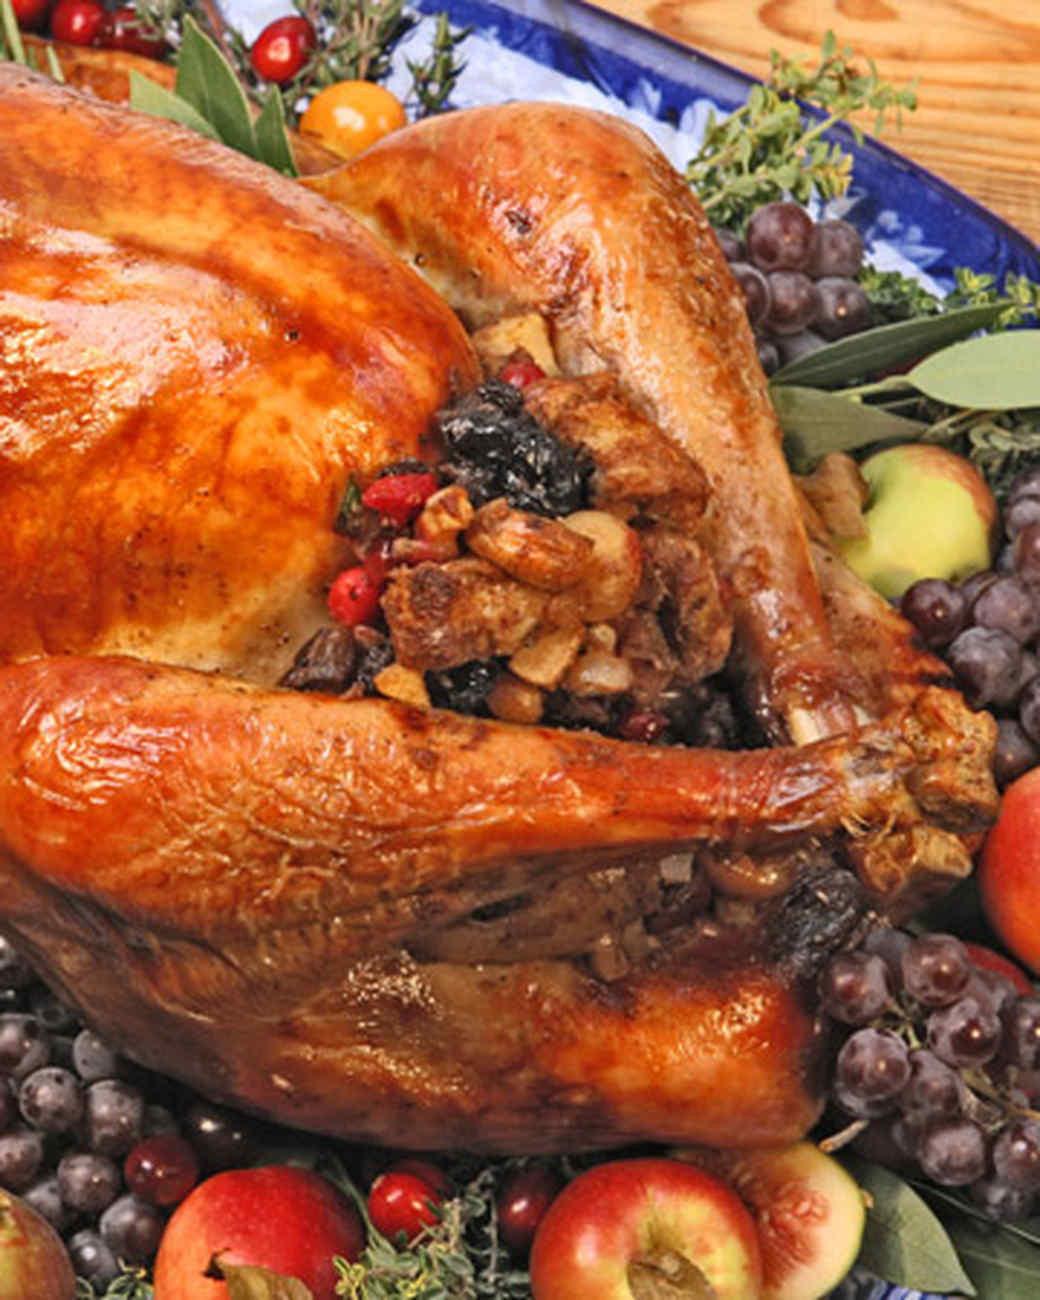 Best Turkey Recipe For Thanksgiving  38 Terrific Thanksgiving Turkey Recipes